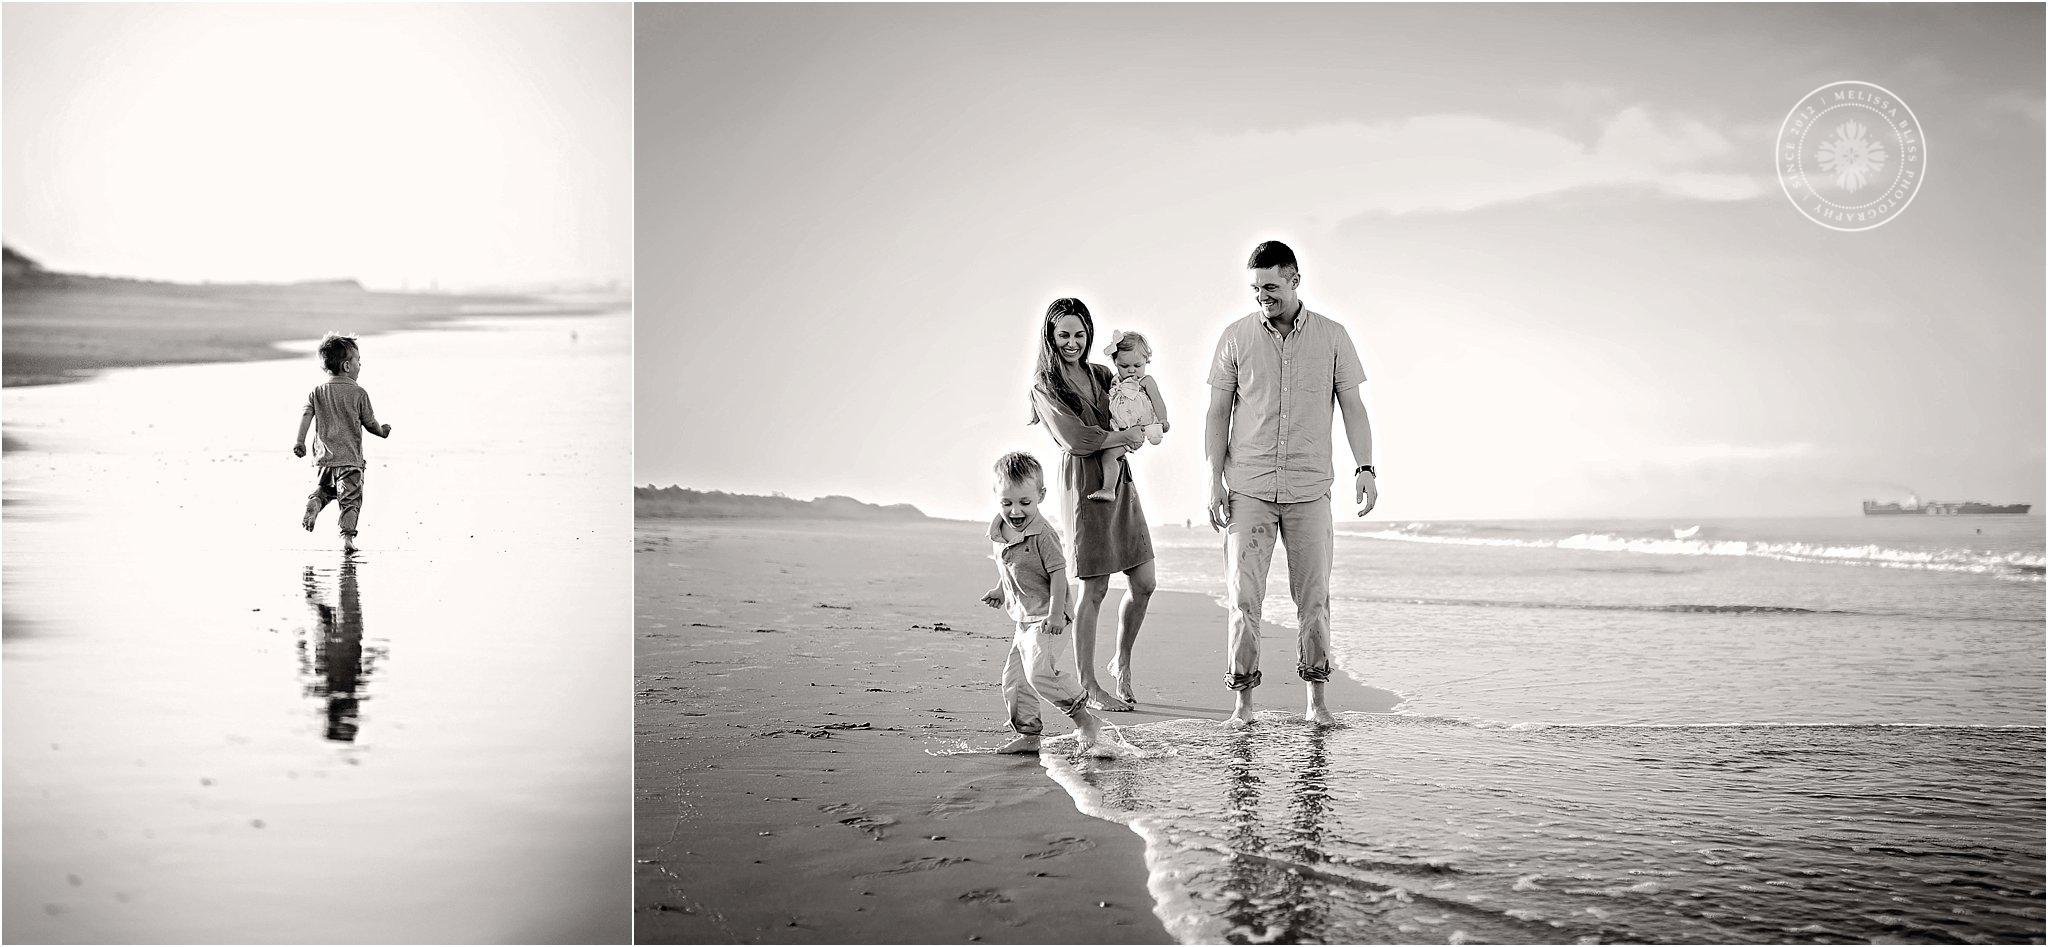 virginia-beach-norfolk-sandbridge-photographer-melissa-bliss-photography